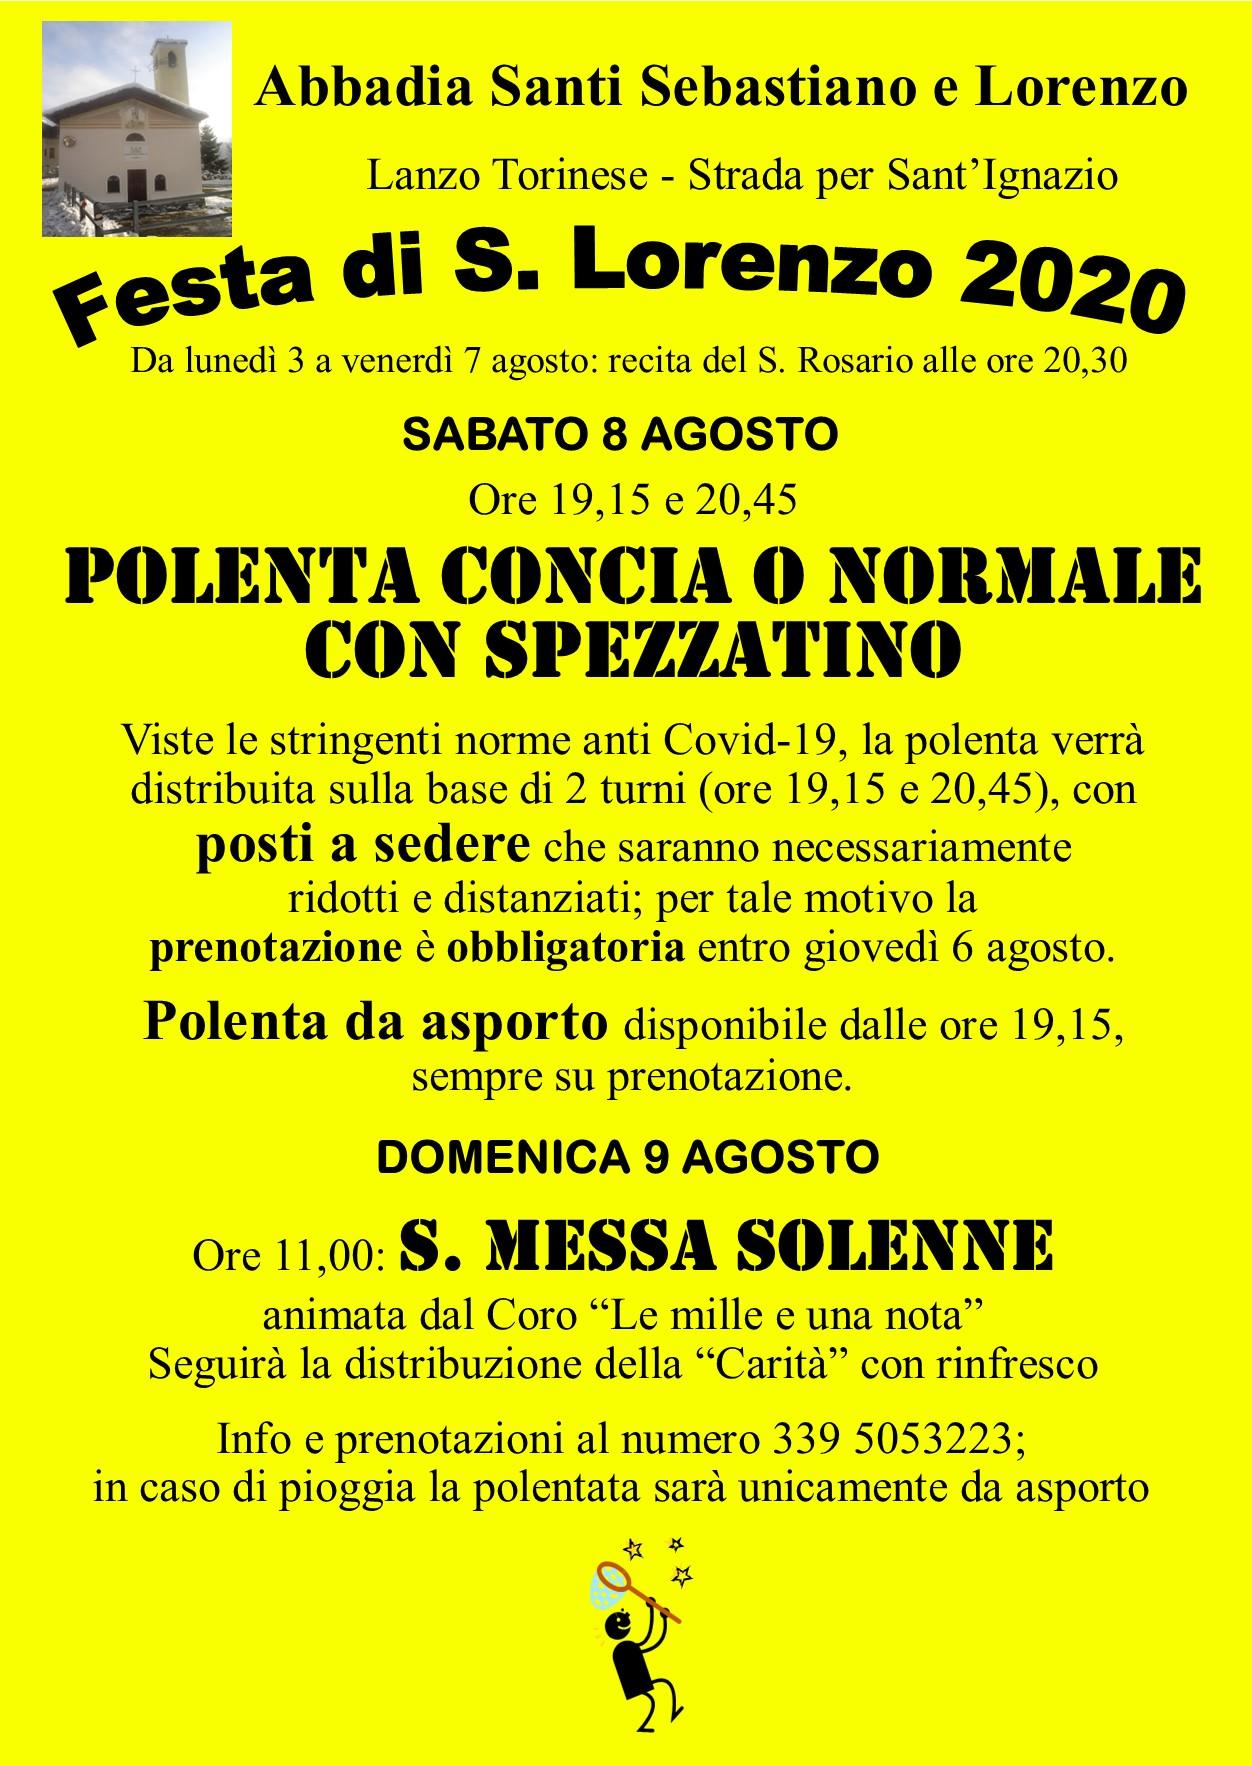 LANZO TORINESE (TO): Festa di San Lorenzo 2020